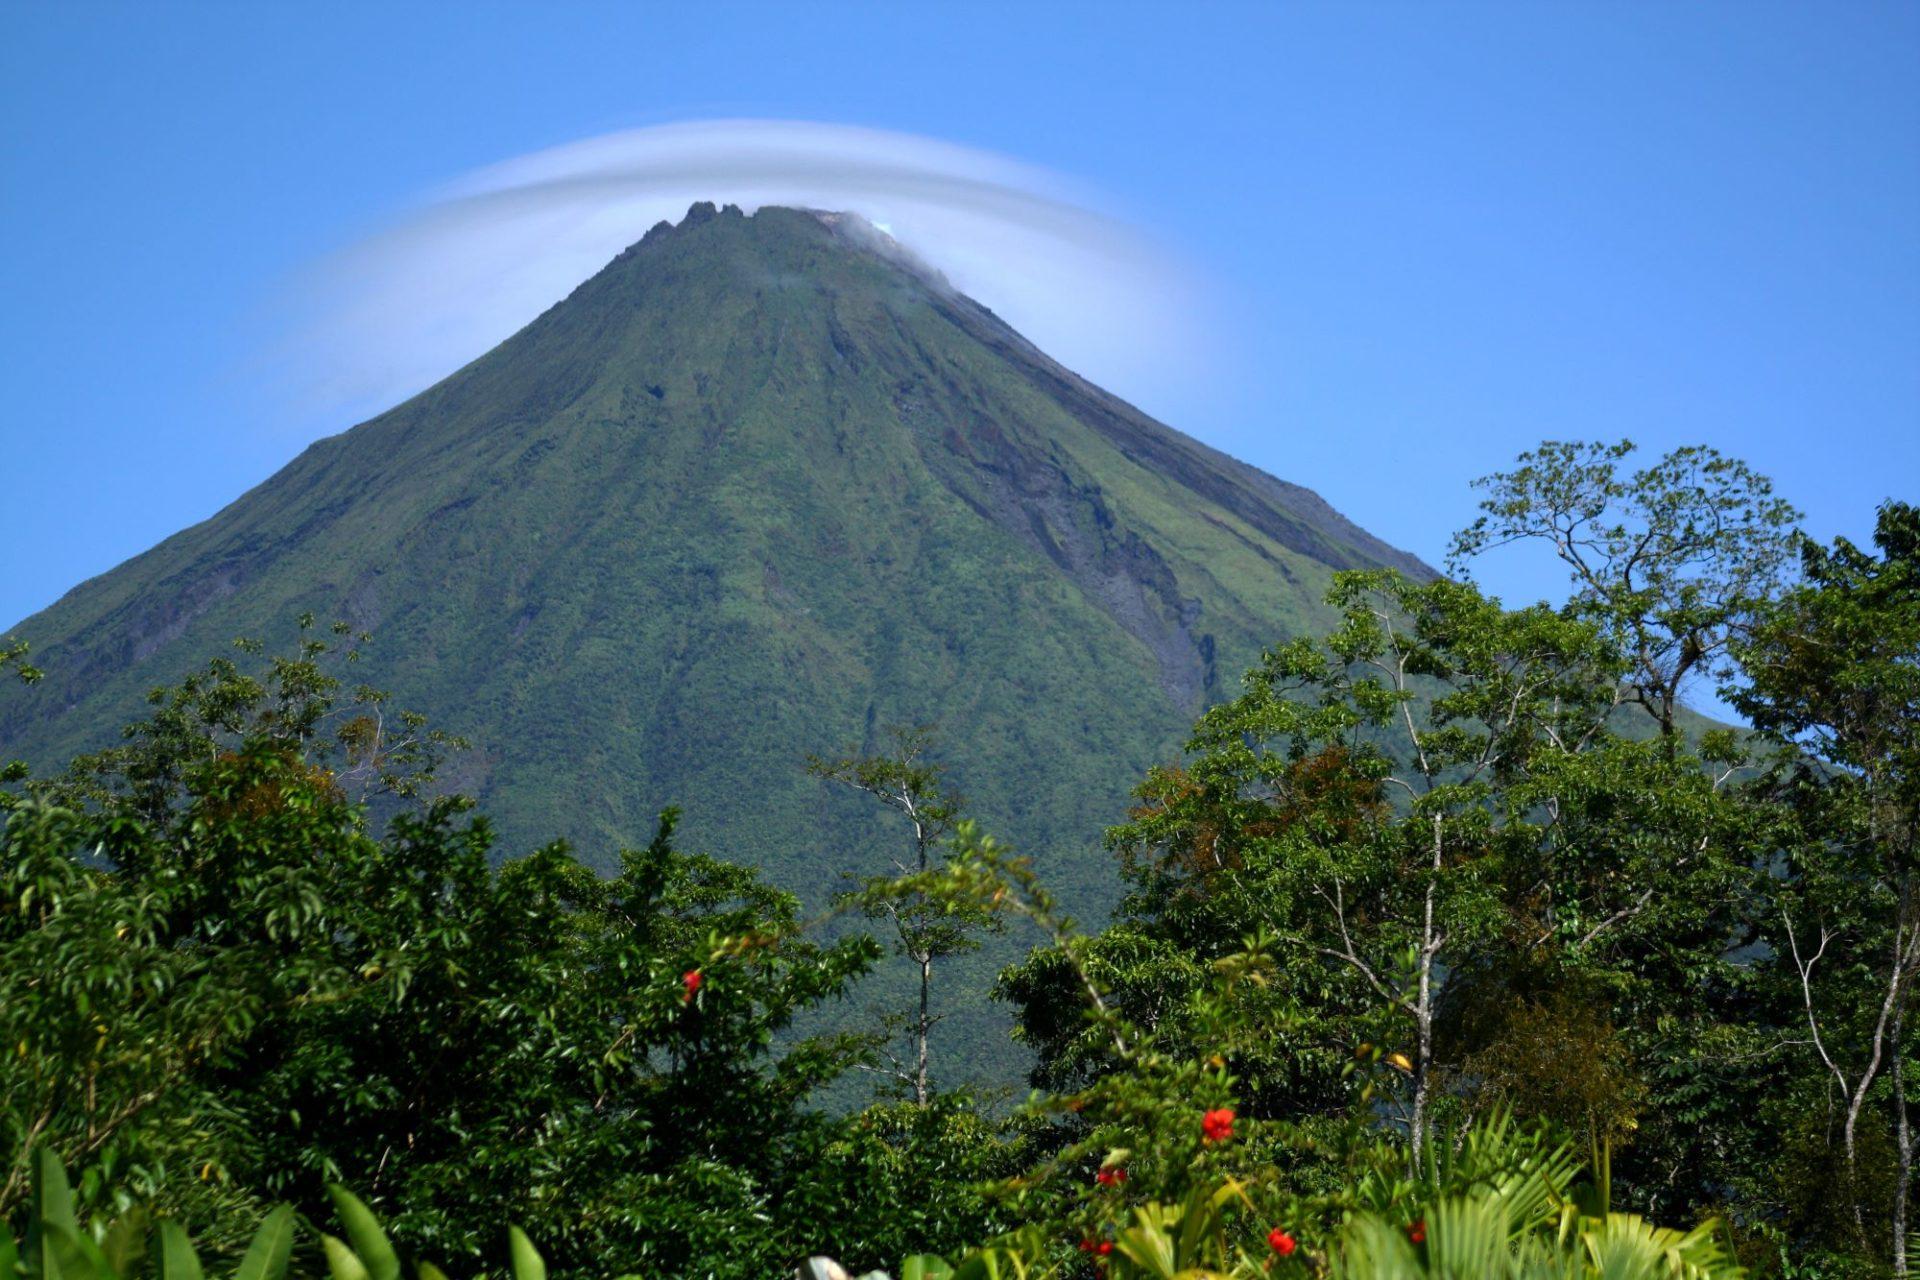 wp-content/uploads/itineraries/Costa-Rica/CRwildlifeDay4.jpg